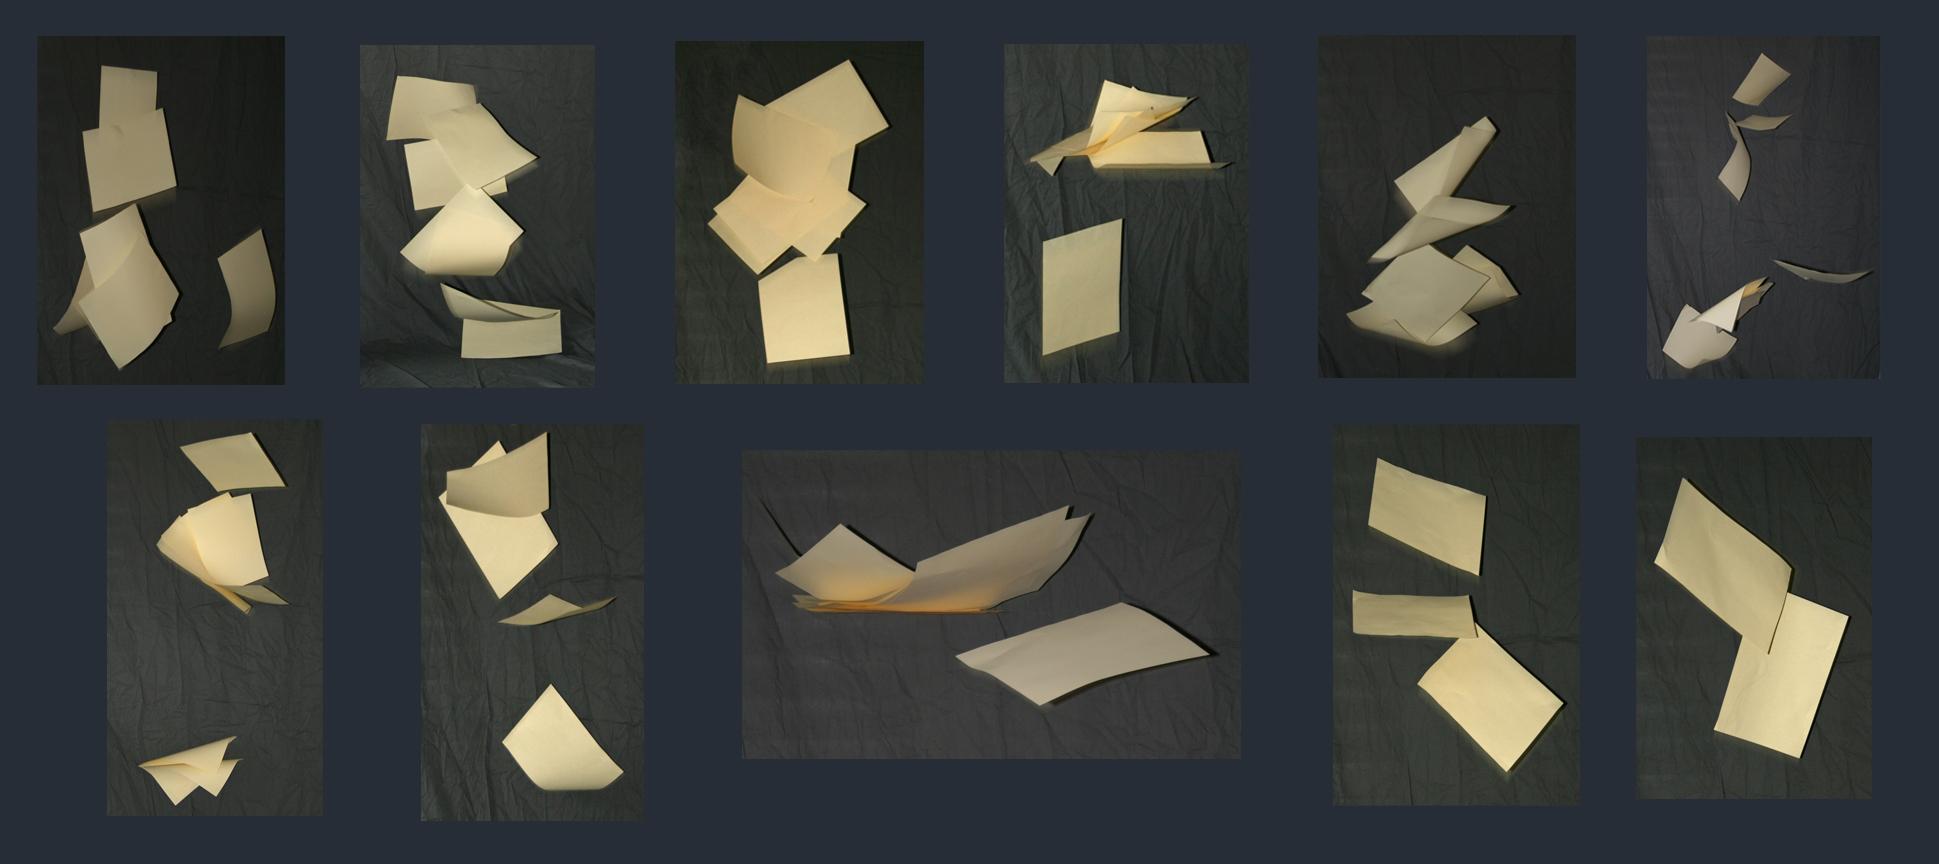 Falling paper pack